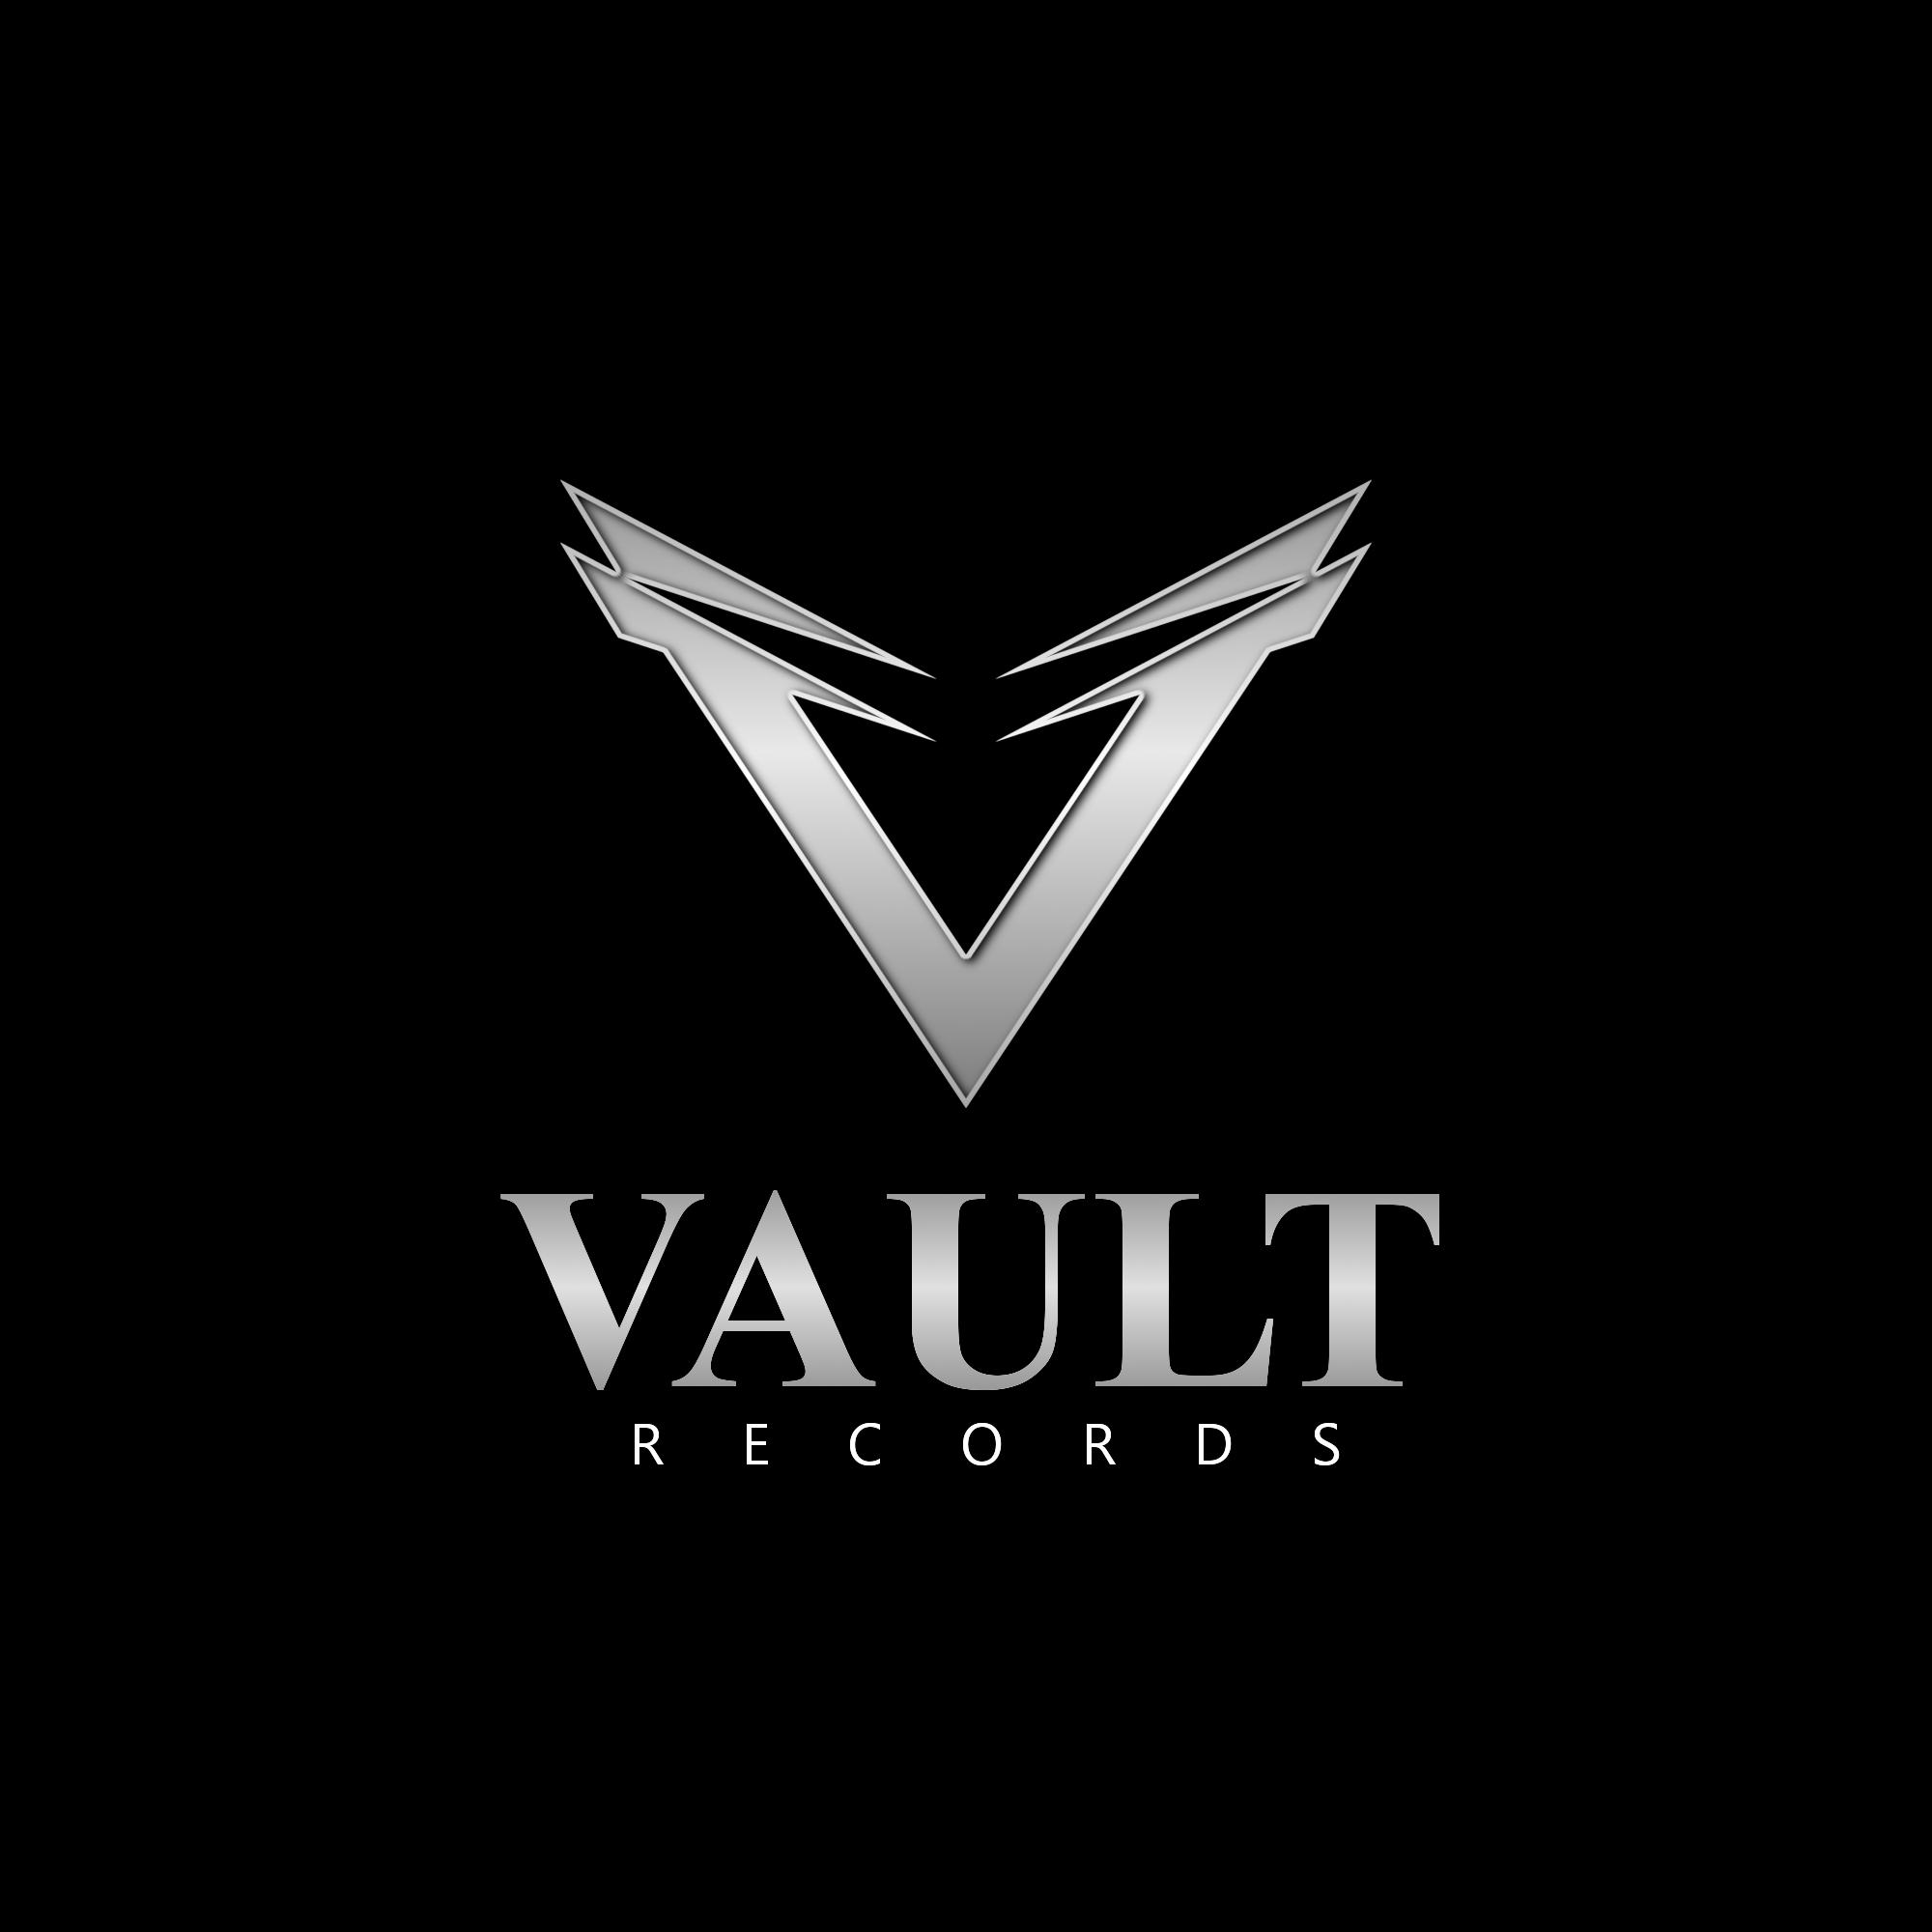 Vault Records